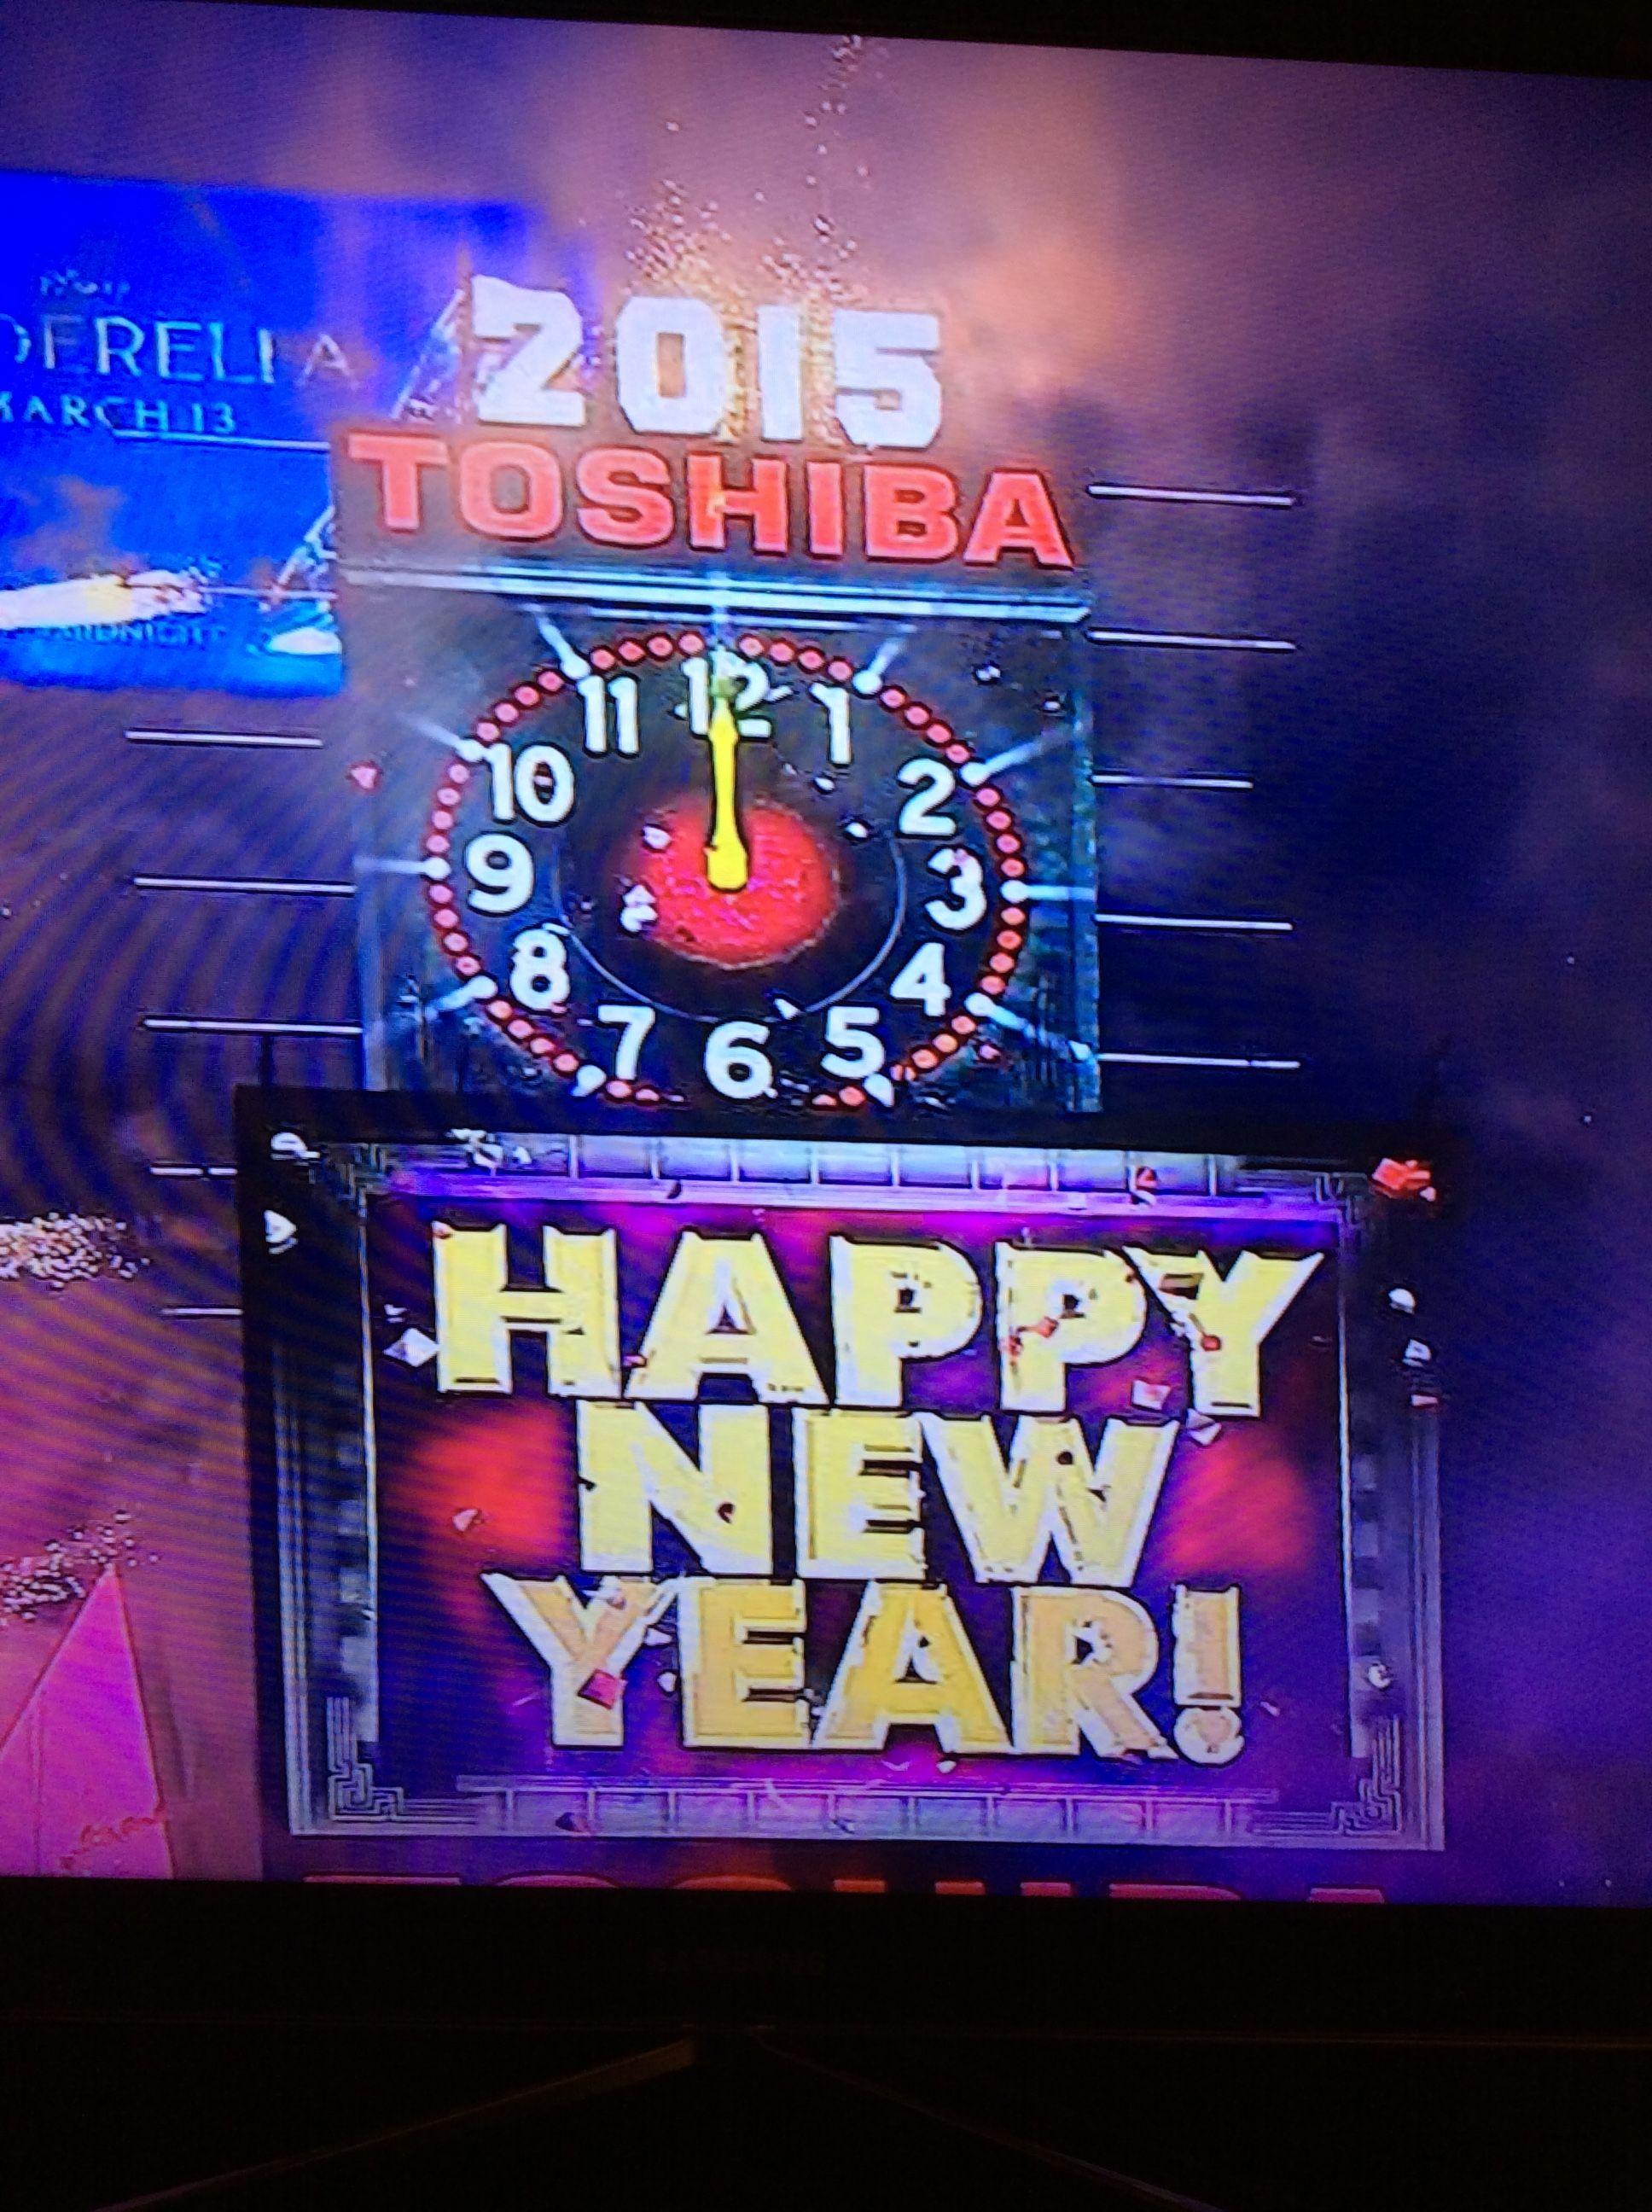 Happy New Year 2015 Happy new year 2015, New years eve